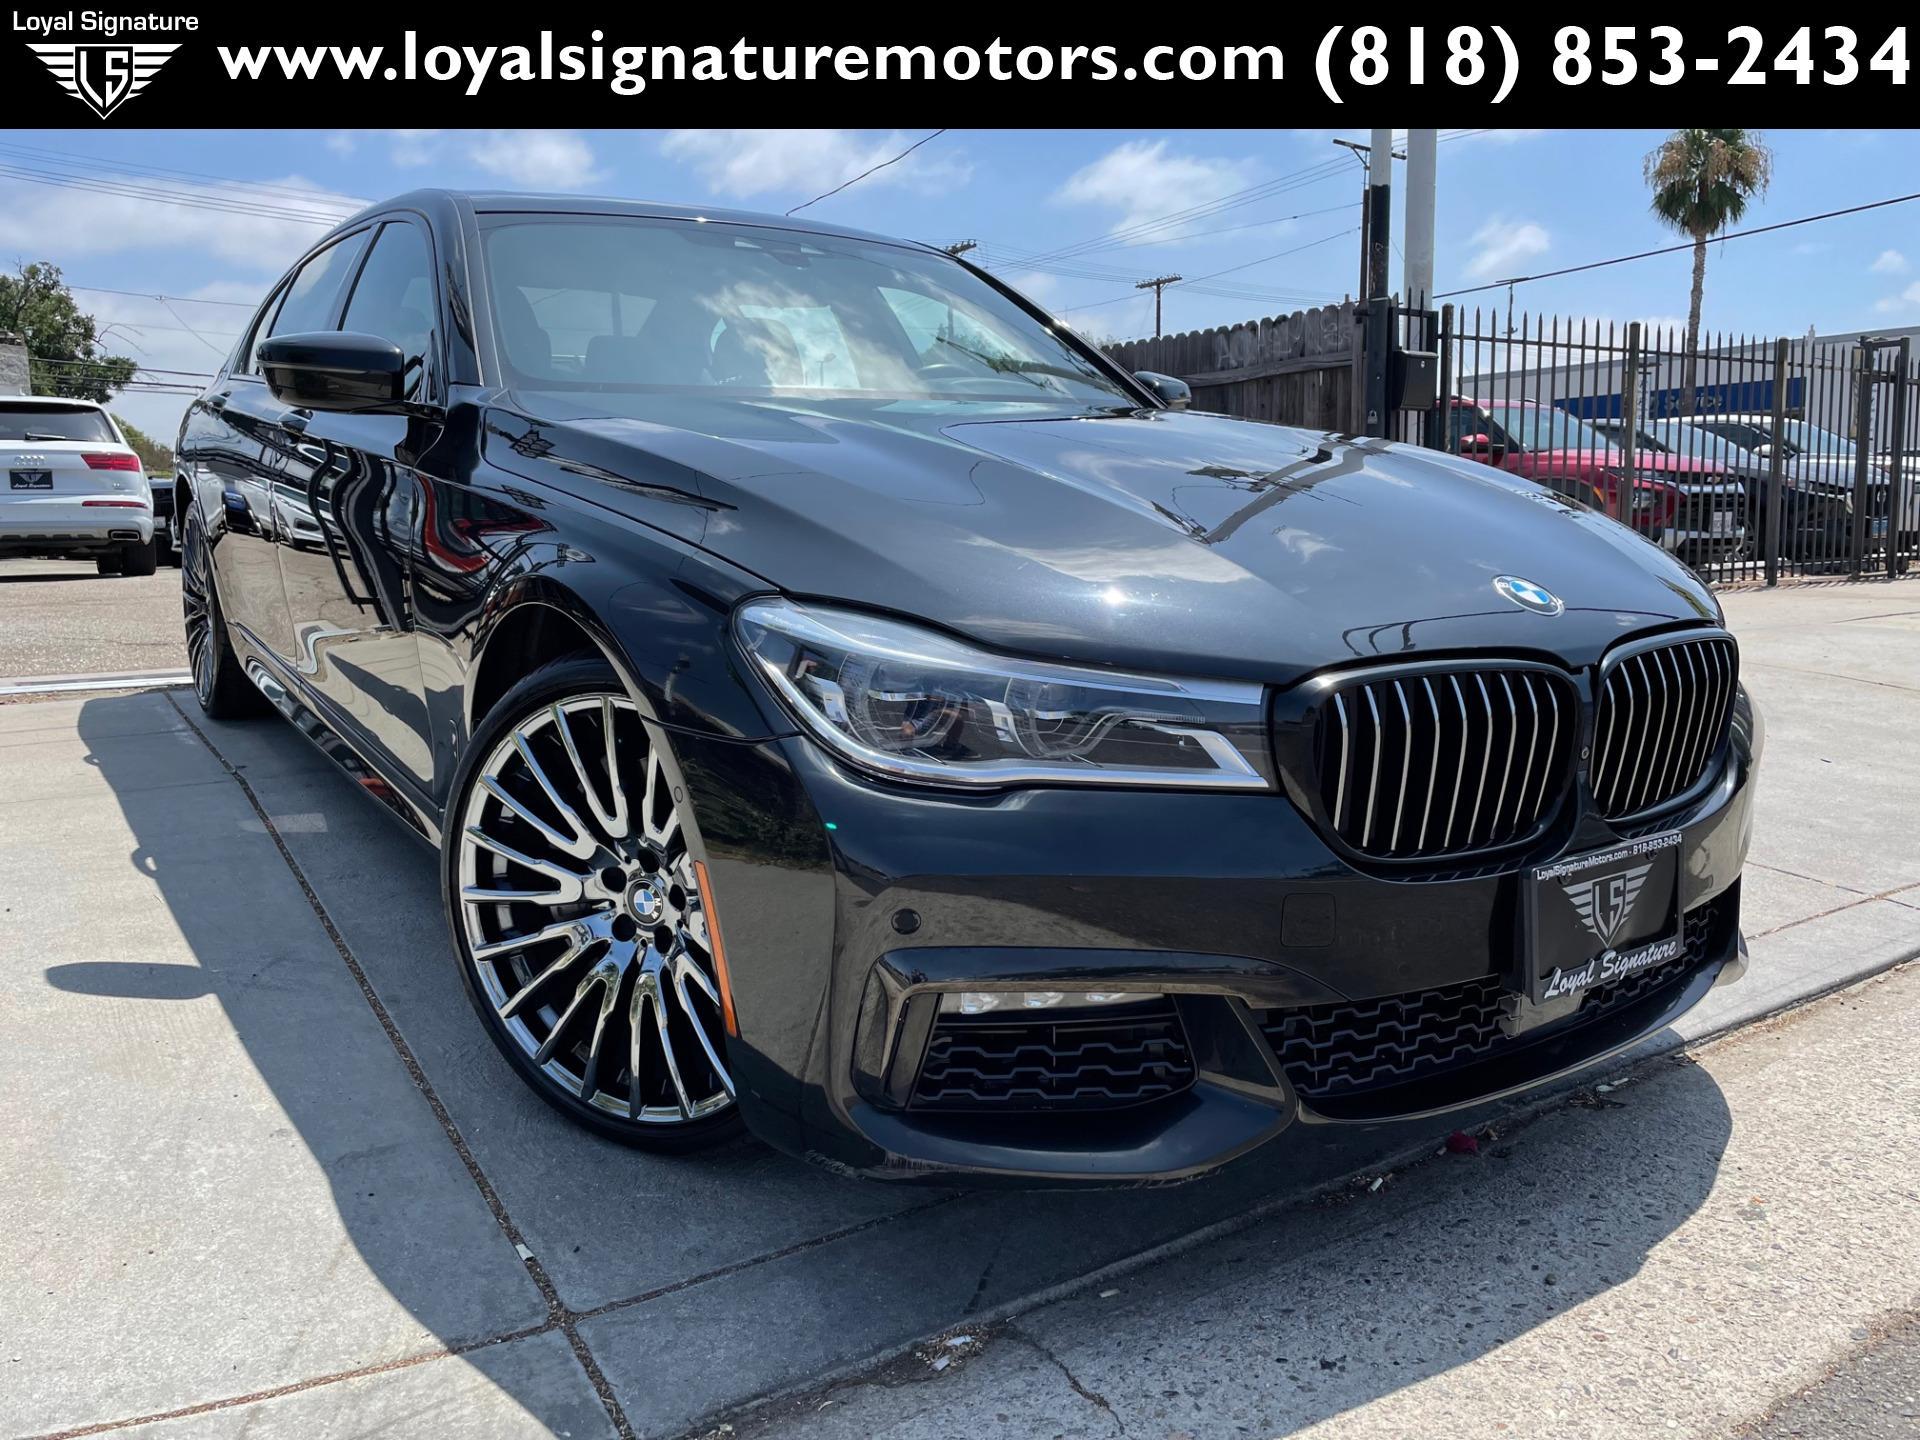 Used 2018 BMW 7 Series 750i | Van Nuys, CA